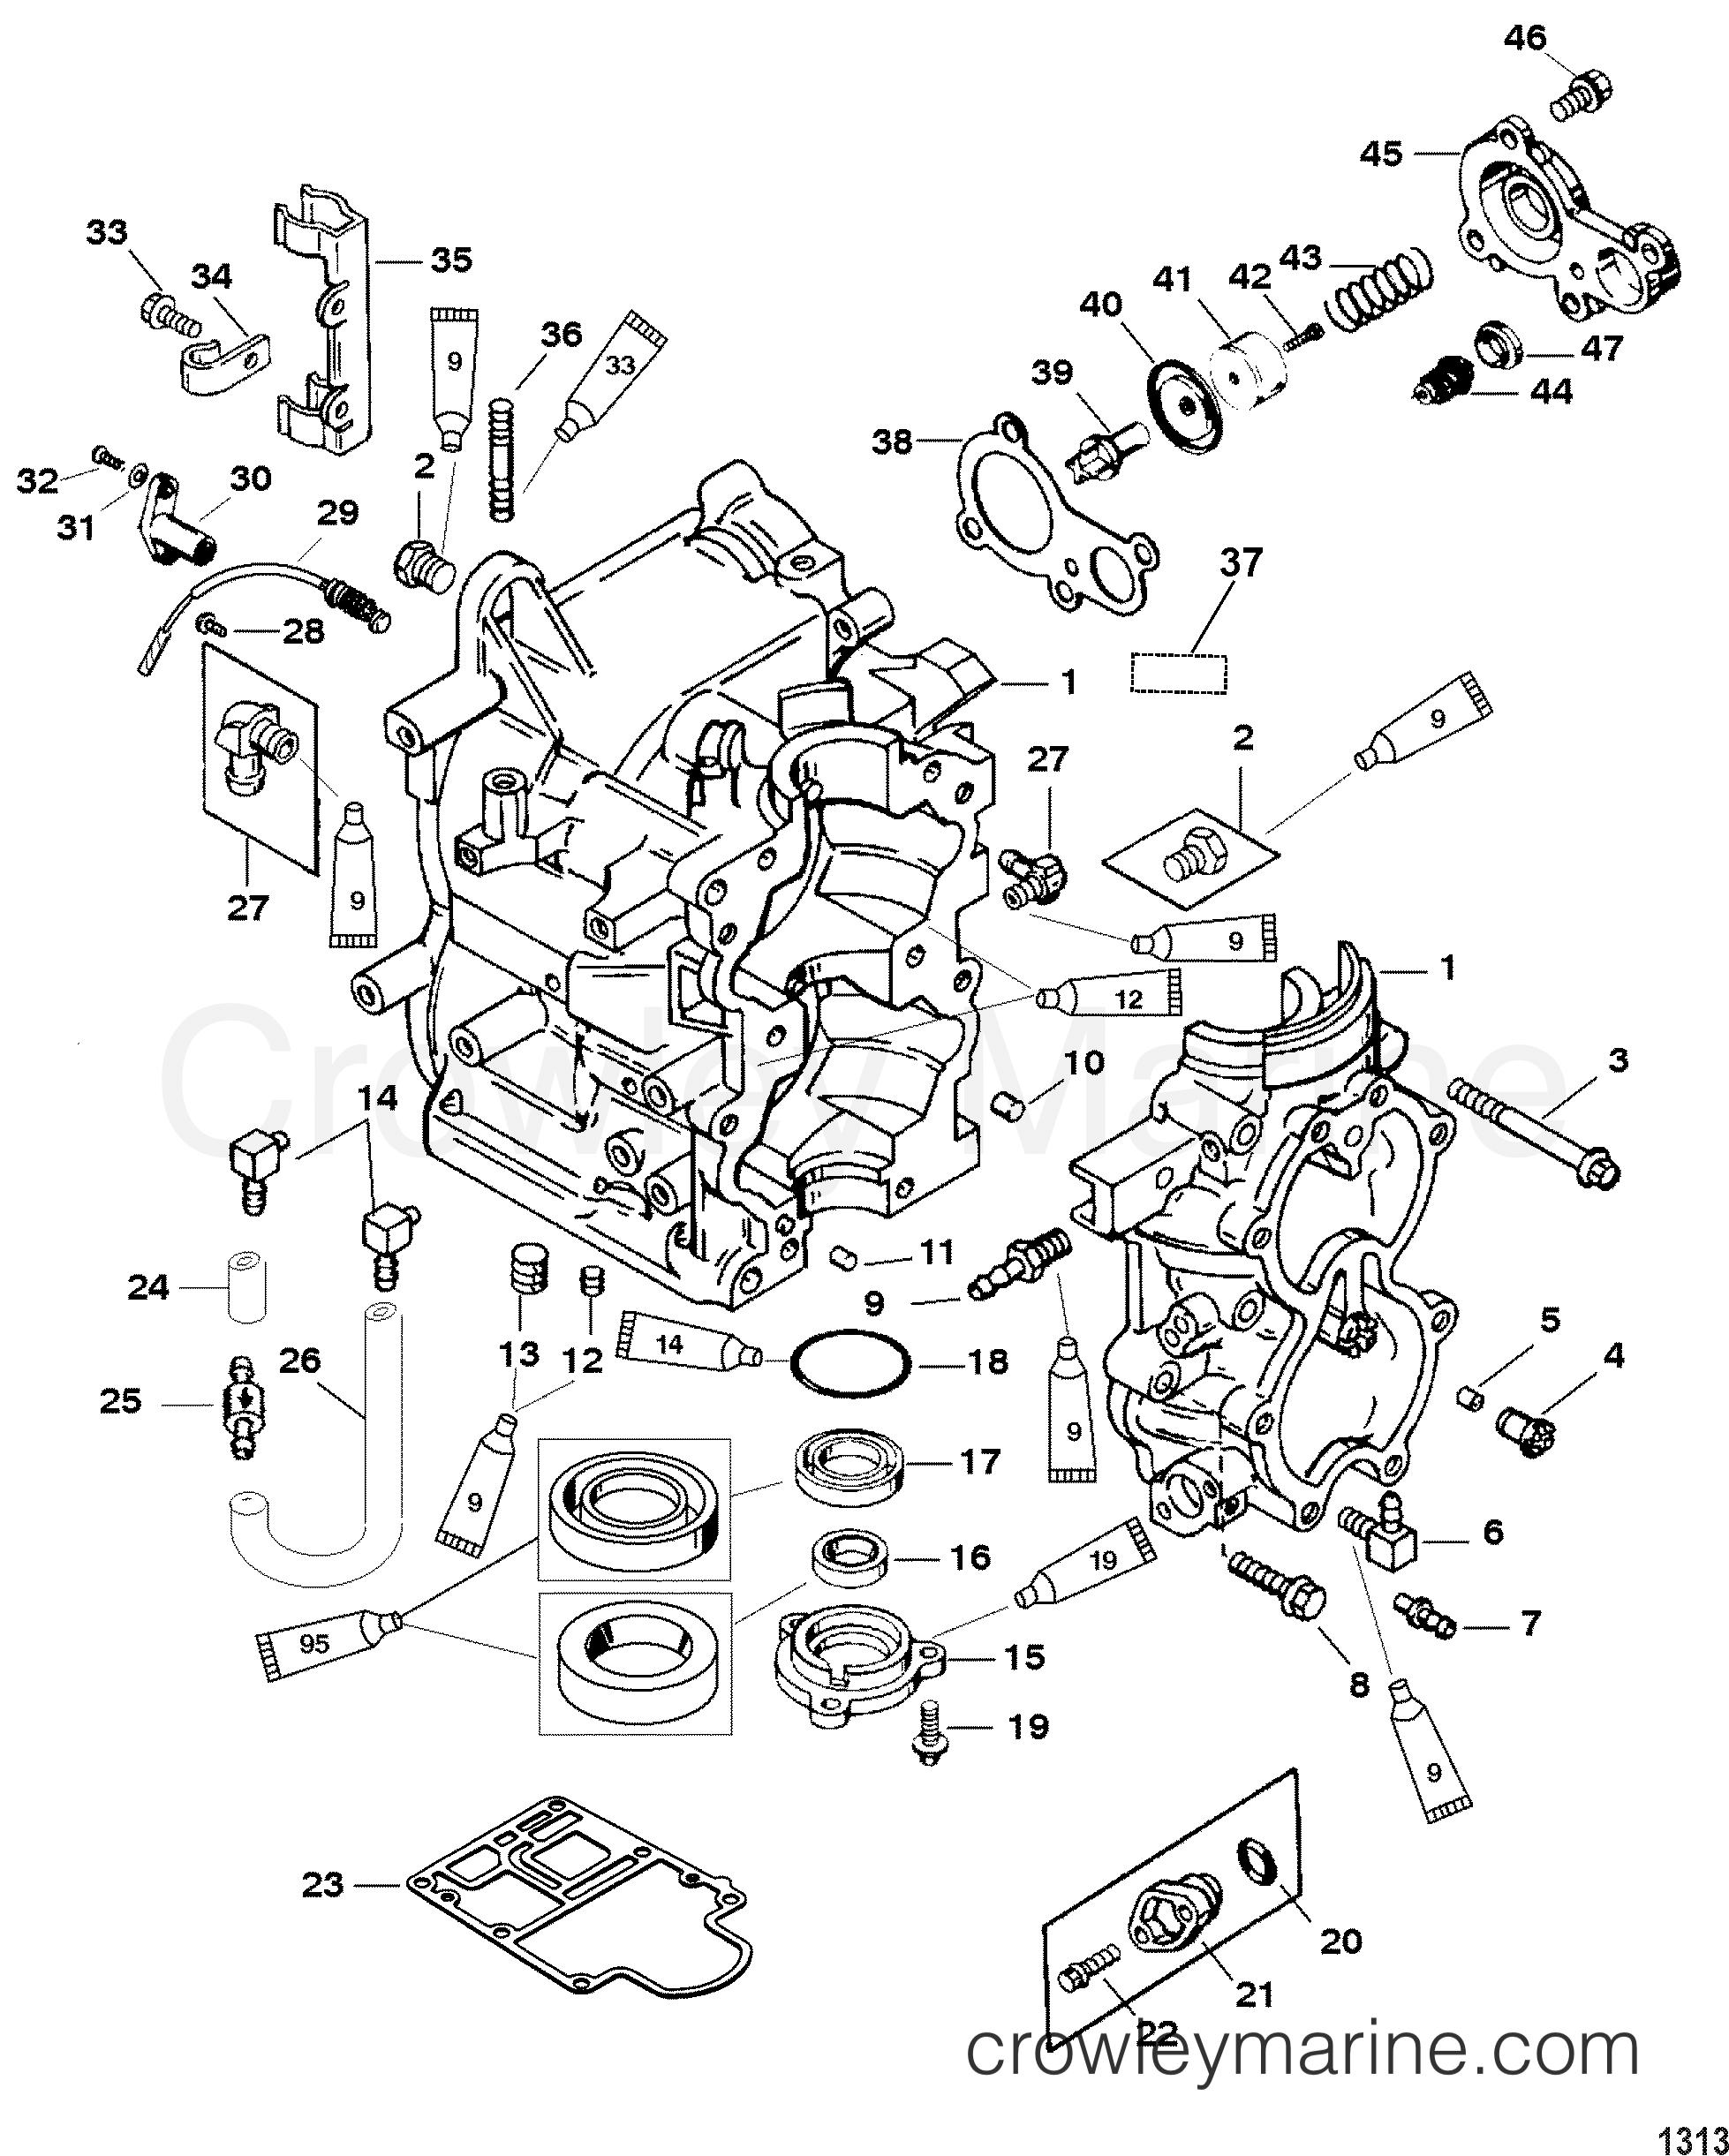 1999 Mariner Outboard 40 [ML/ALT] - 7041213HD - CYLINDER BLOCK section